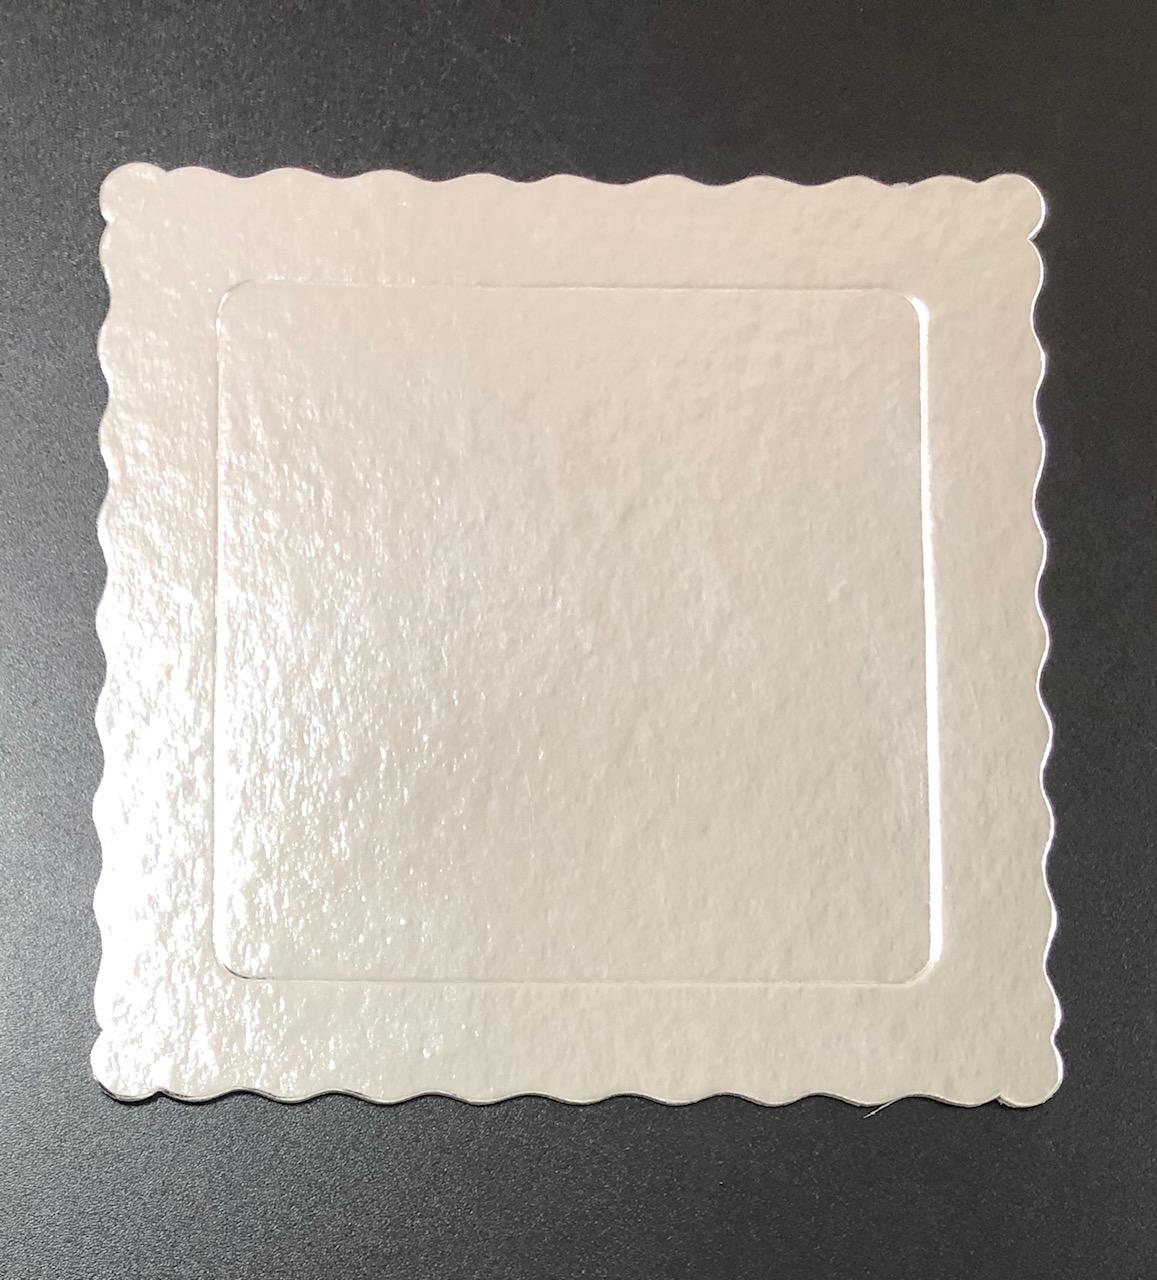 100 Bases Laminadas, Suporte P/ Bolo, Cake Board, 20x20cm - Prata